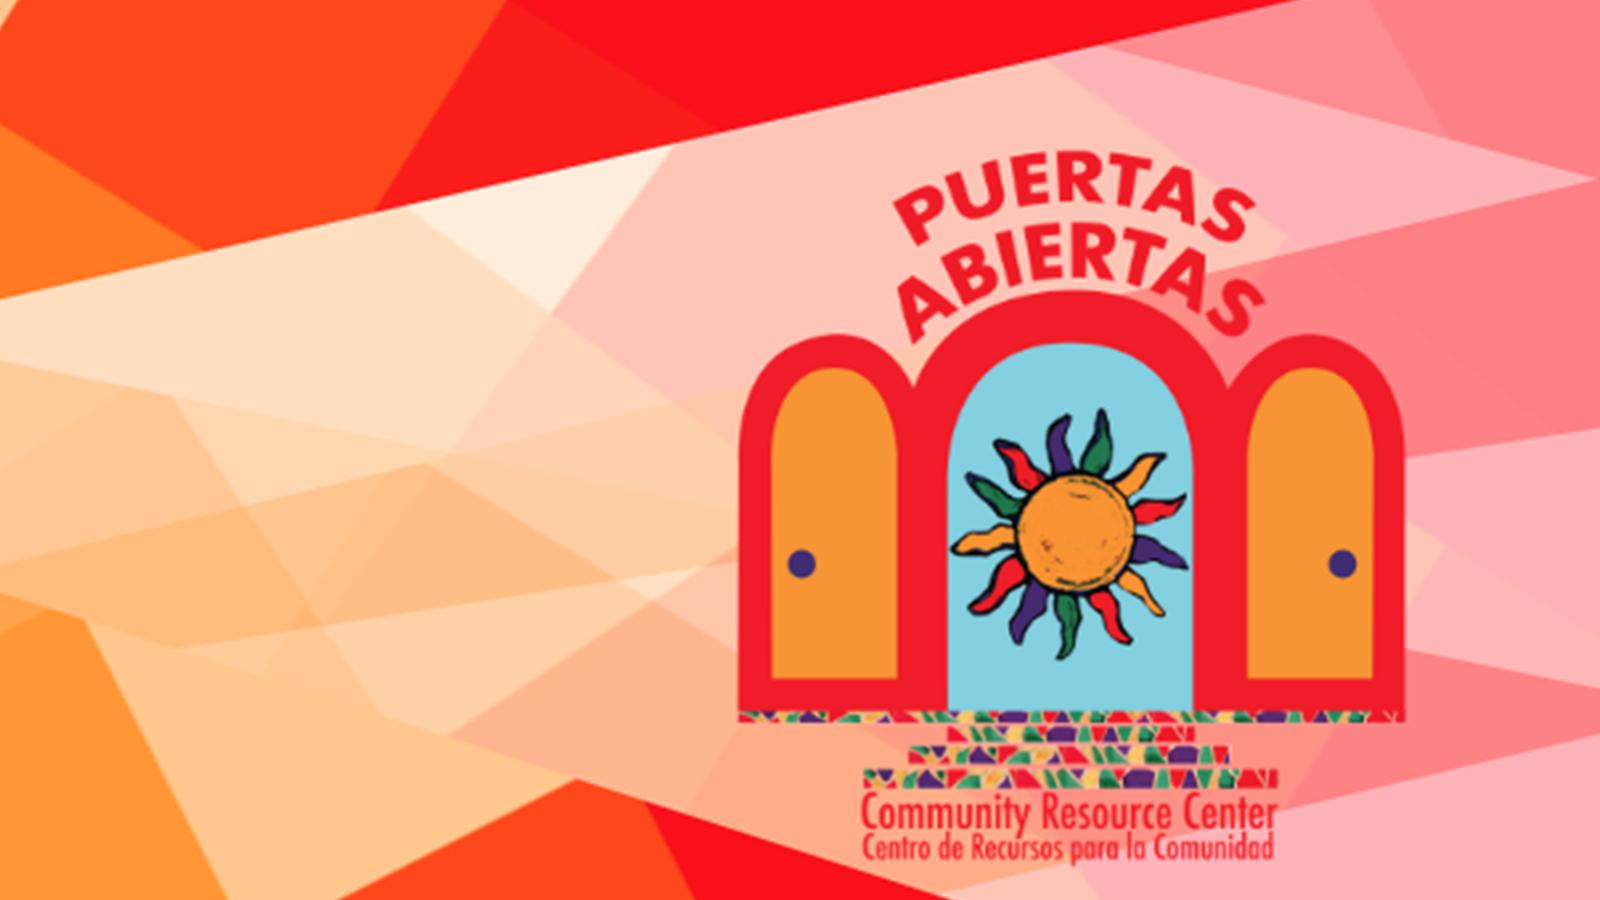 Puertas Abiertas Community Resource Center logo.